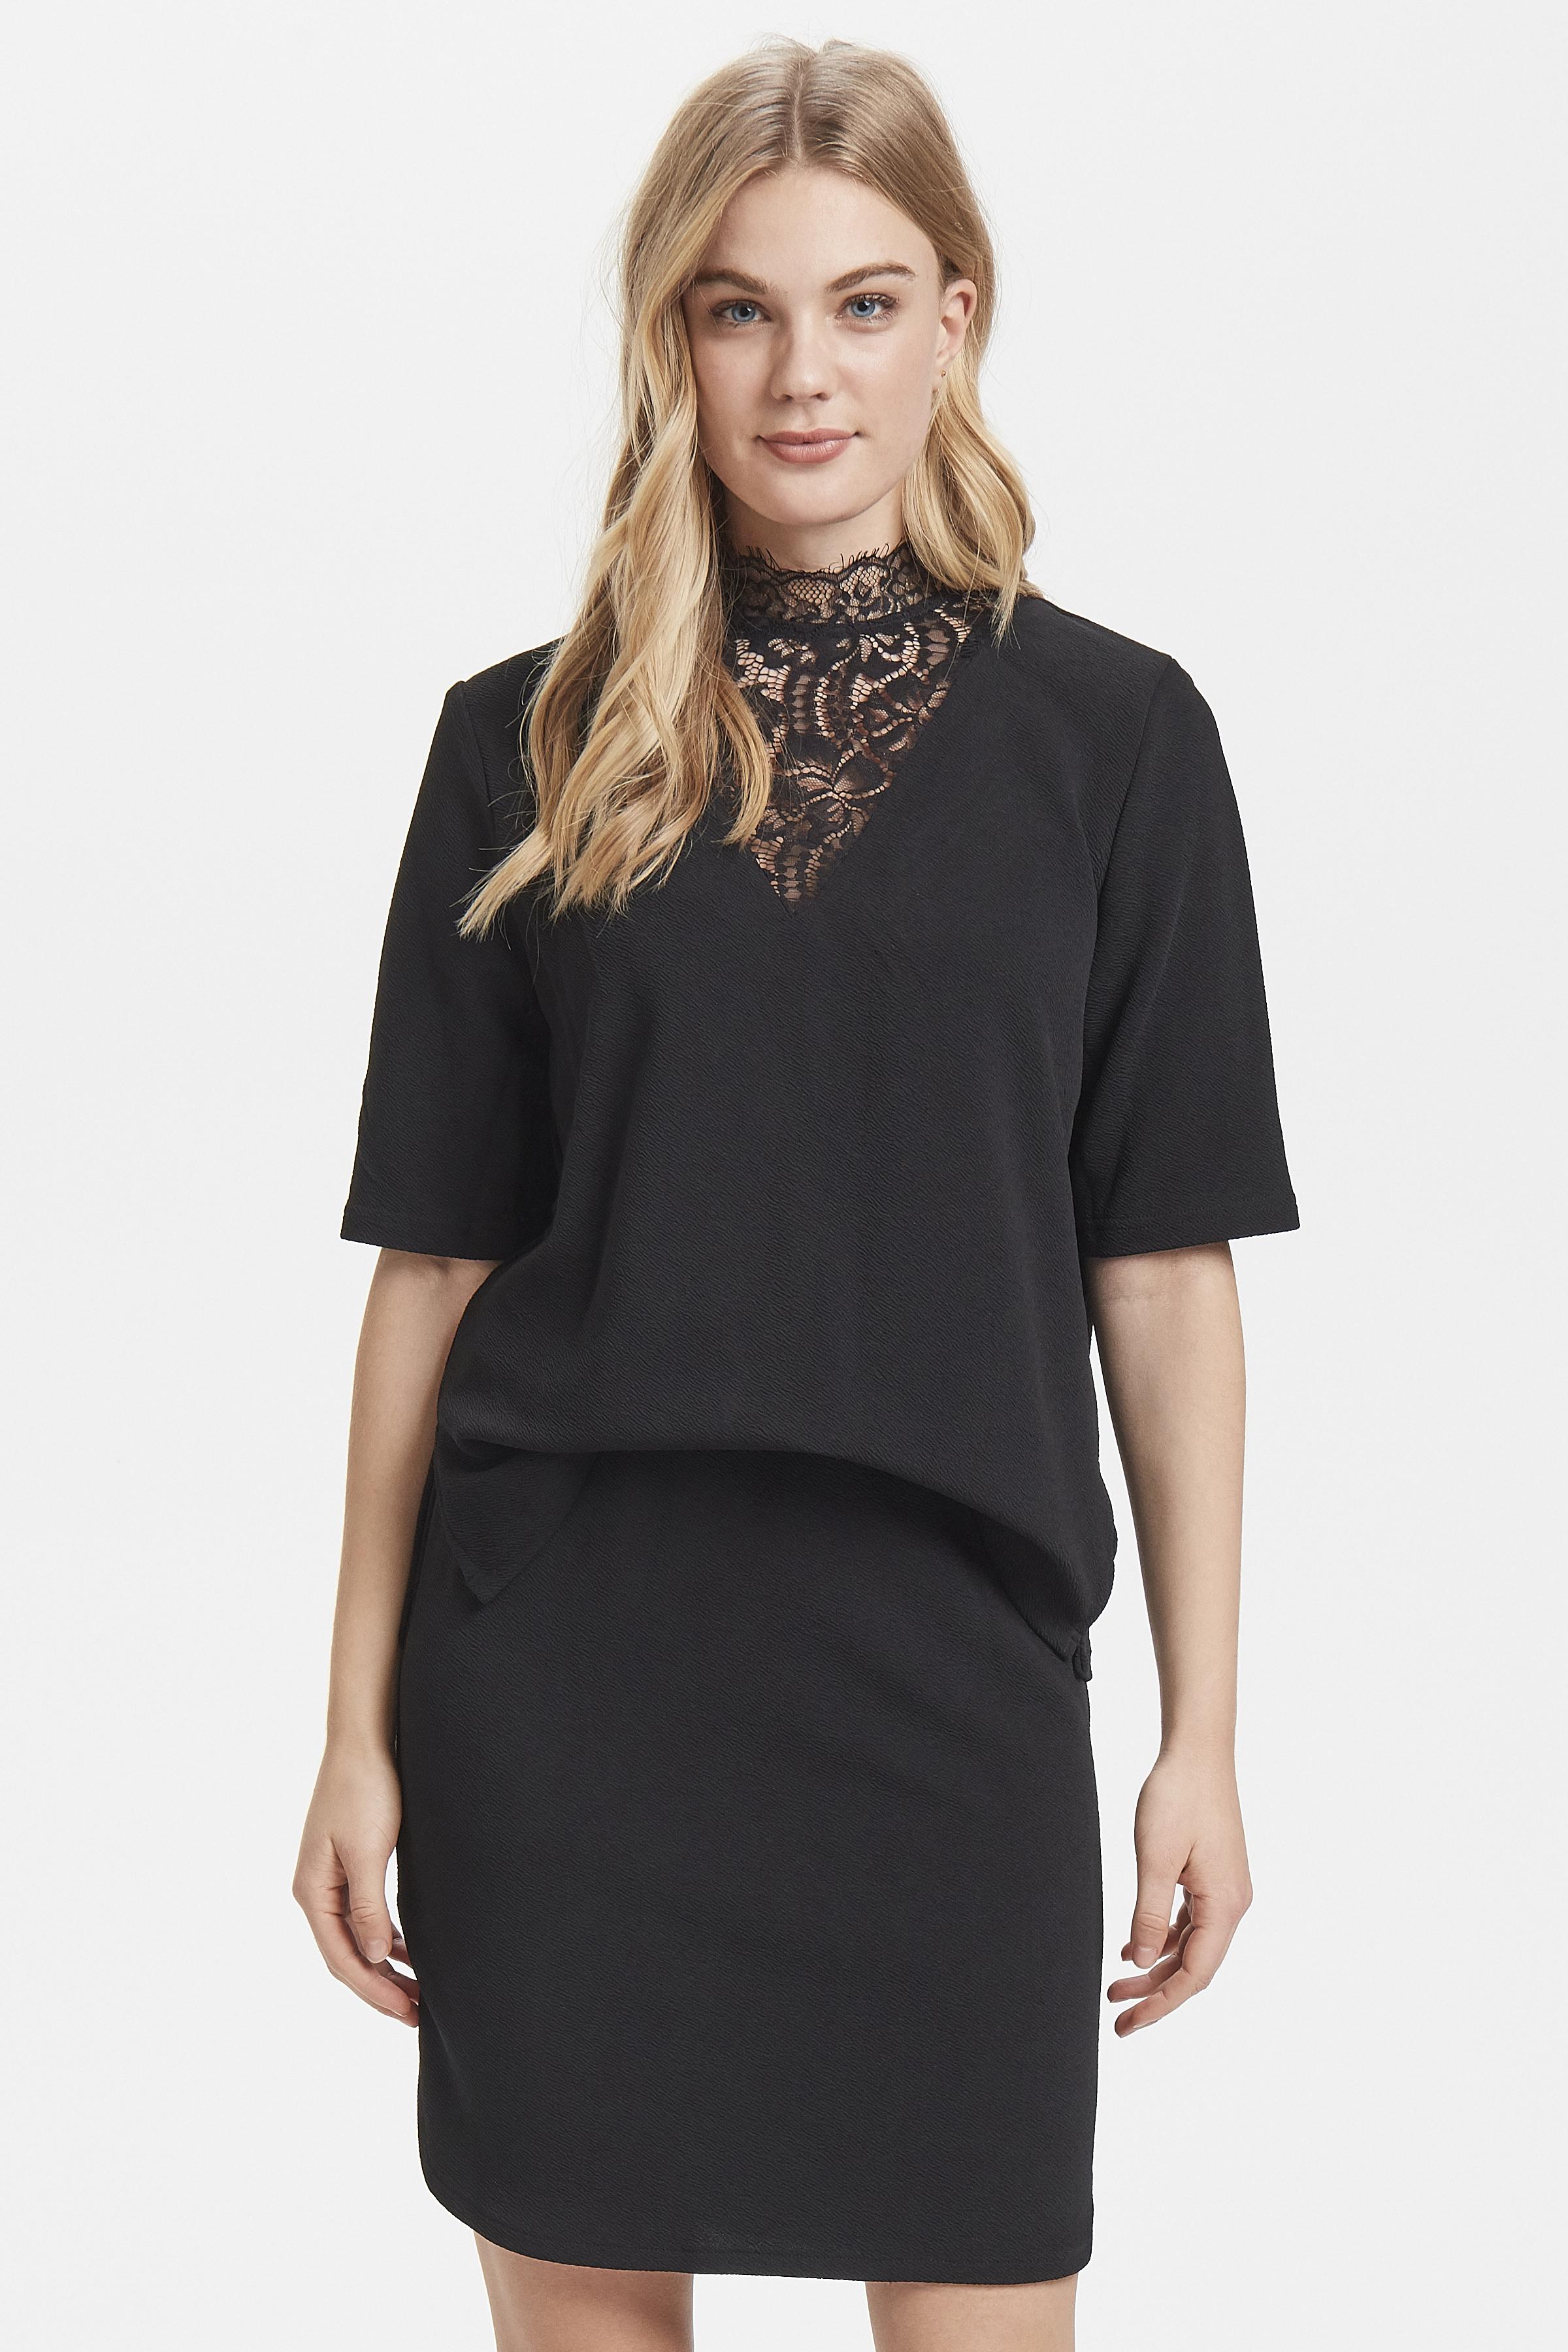 Black Jerseykjole fra b.young – Køb Black Jerseykjole fra str. XS-XL her